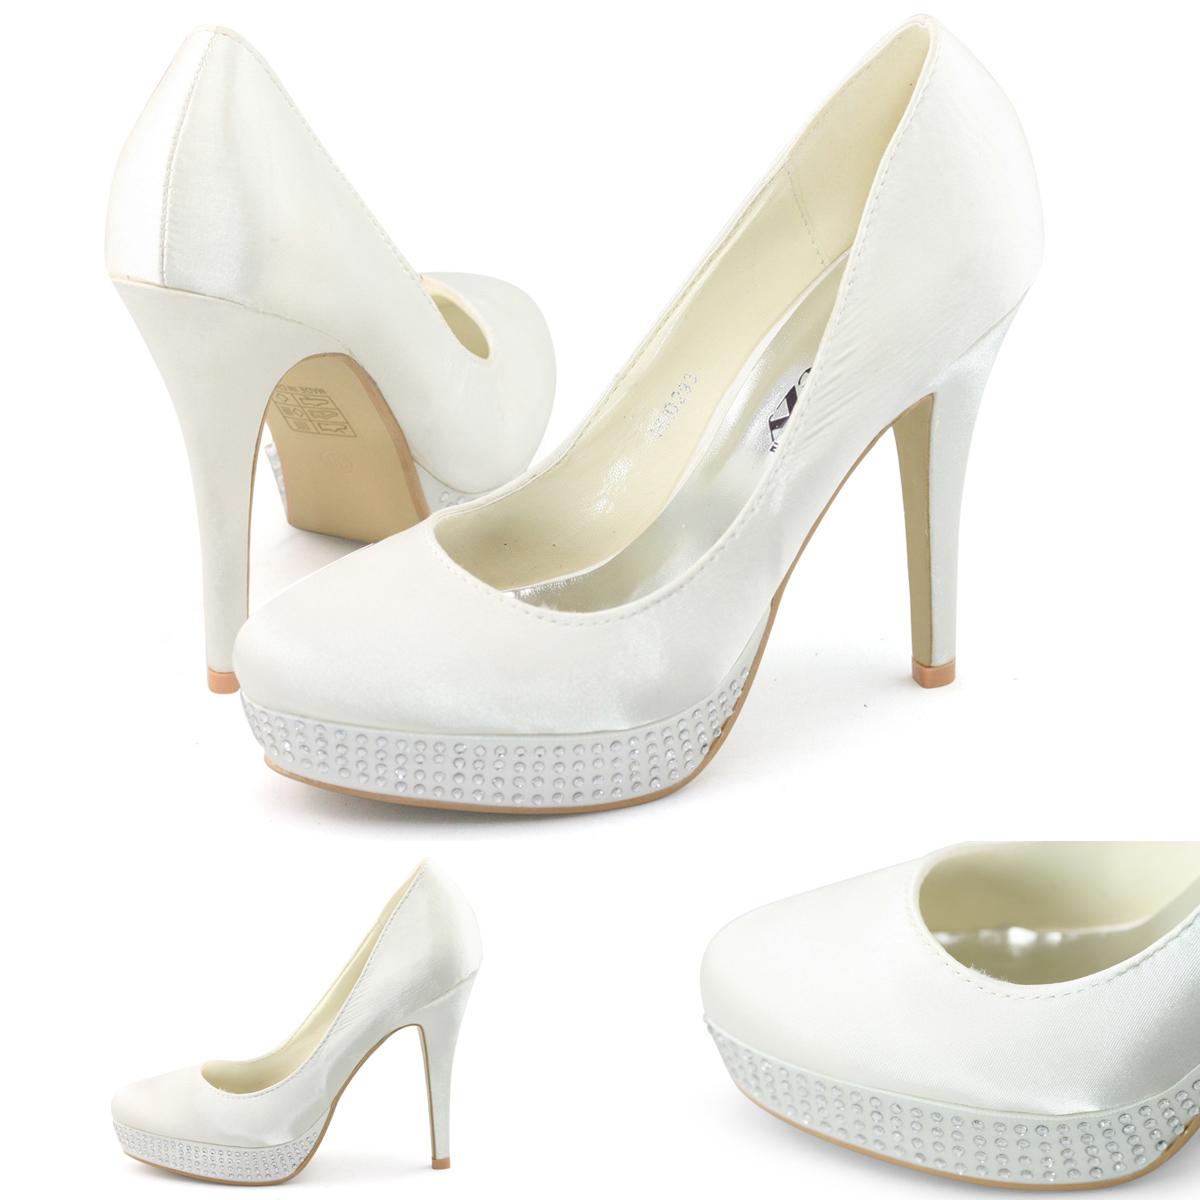 shoezy womens ivory satin platform diamante wedding dress. Black Bedroom Furniture Sets. Home Design Ideas